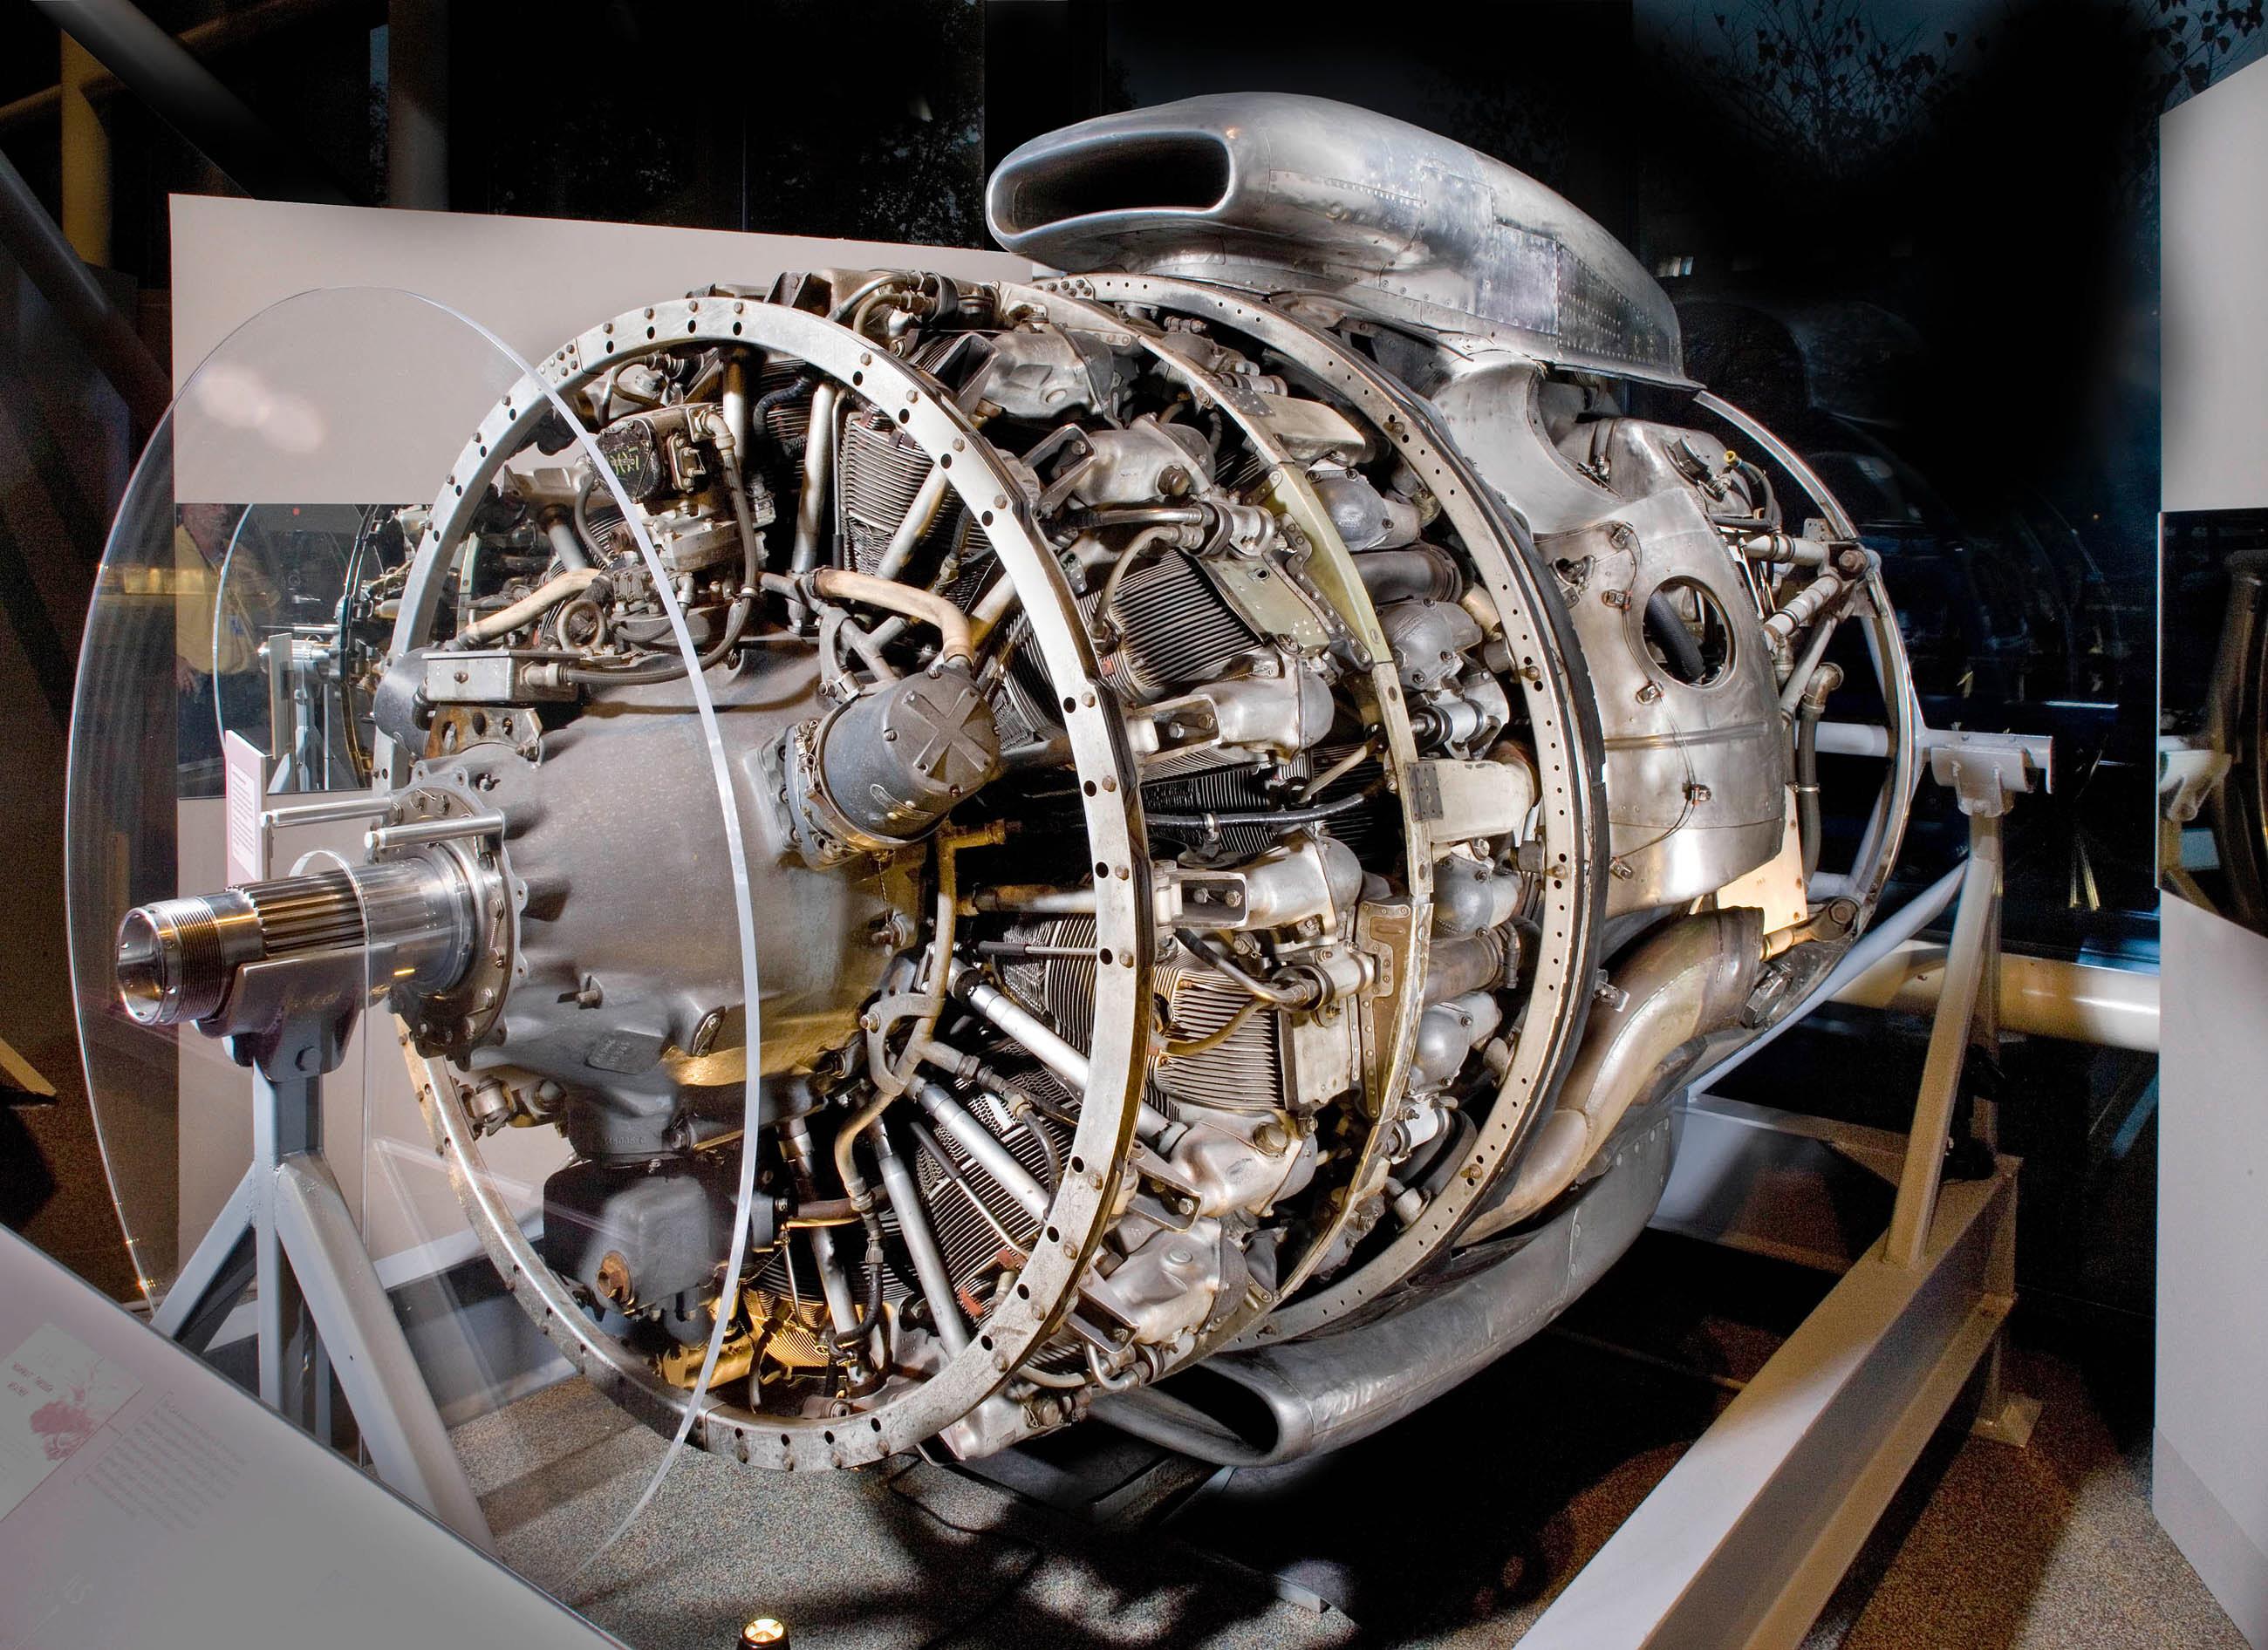 Wright Turbo-Cyclone 18R-3350-TC Radial Engine